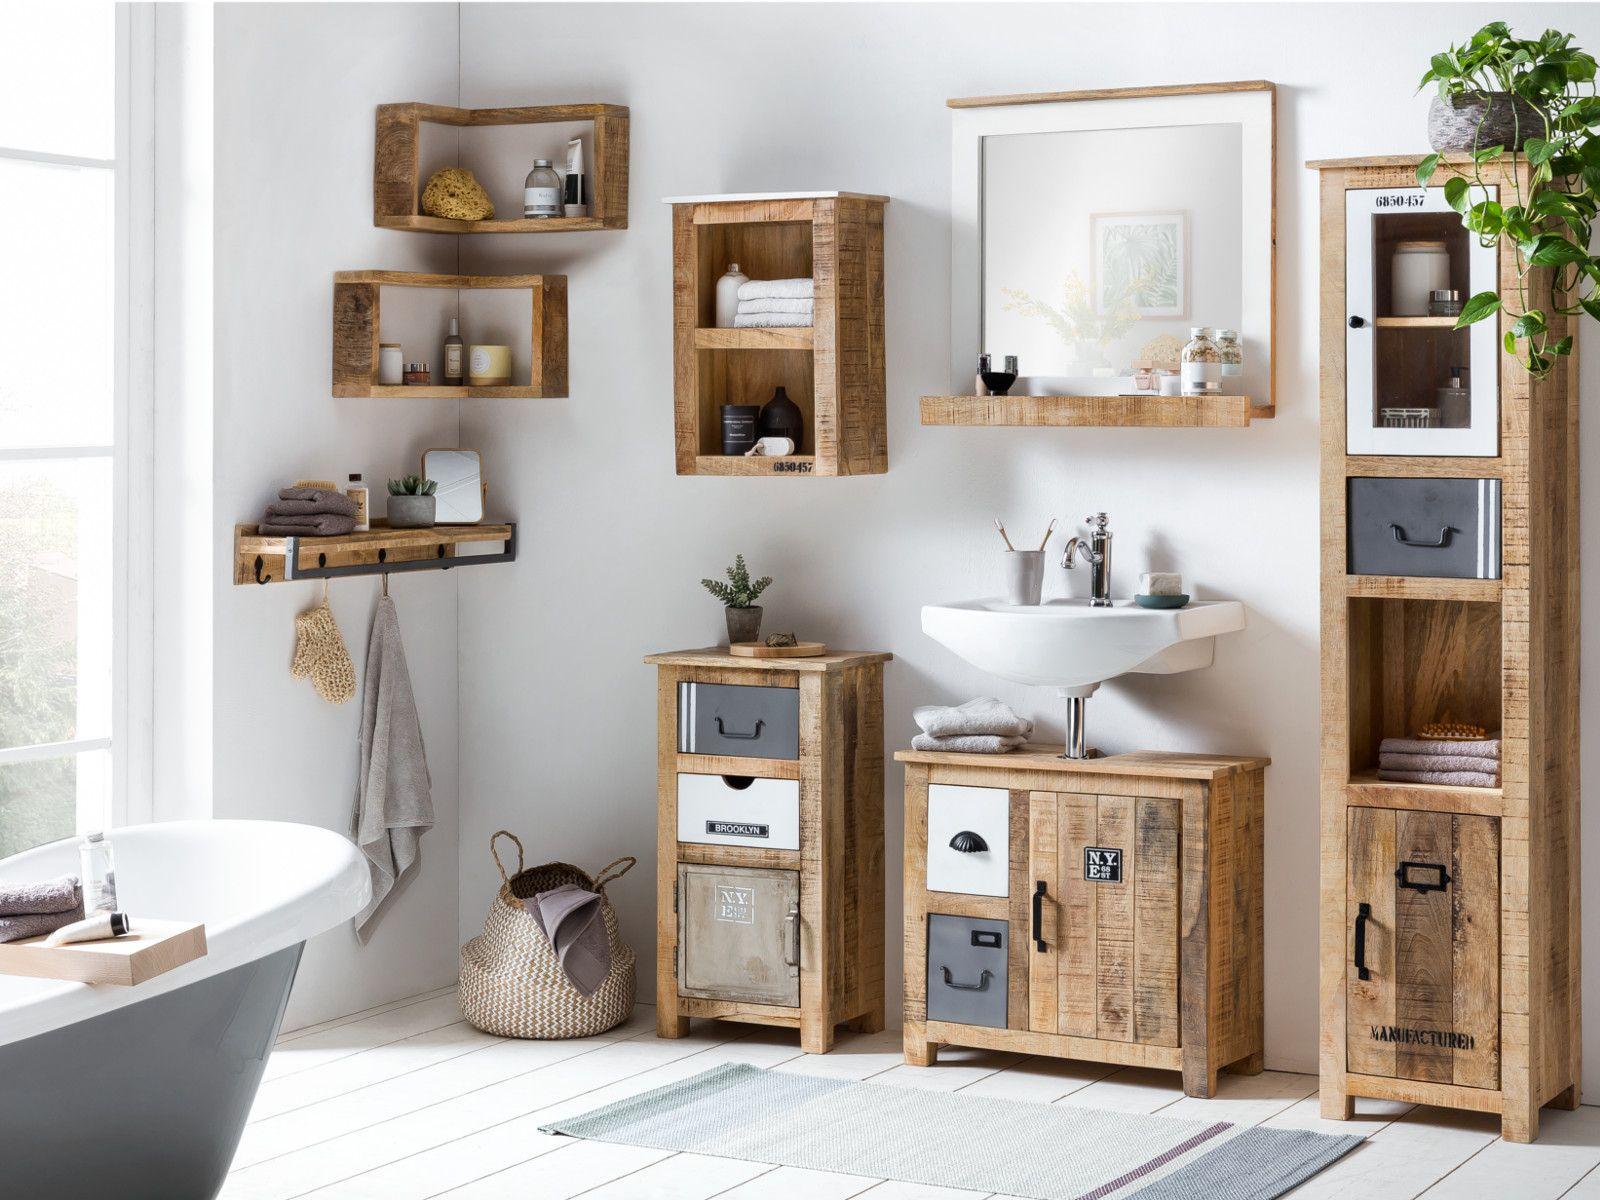 Woodkings Shop Waschtisch Holz Badezimmer Holz Waschbeckenunterschrank